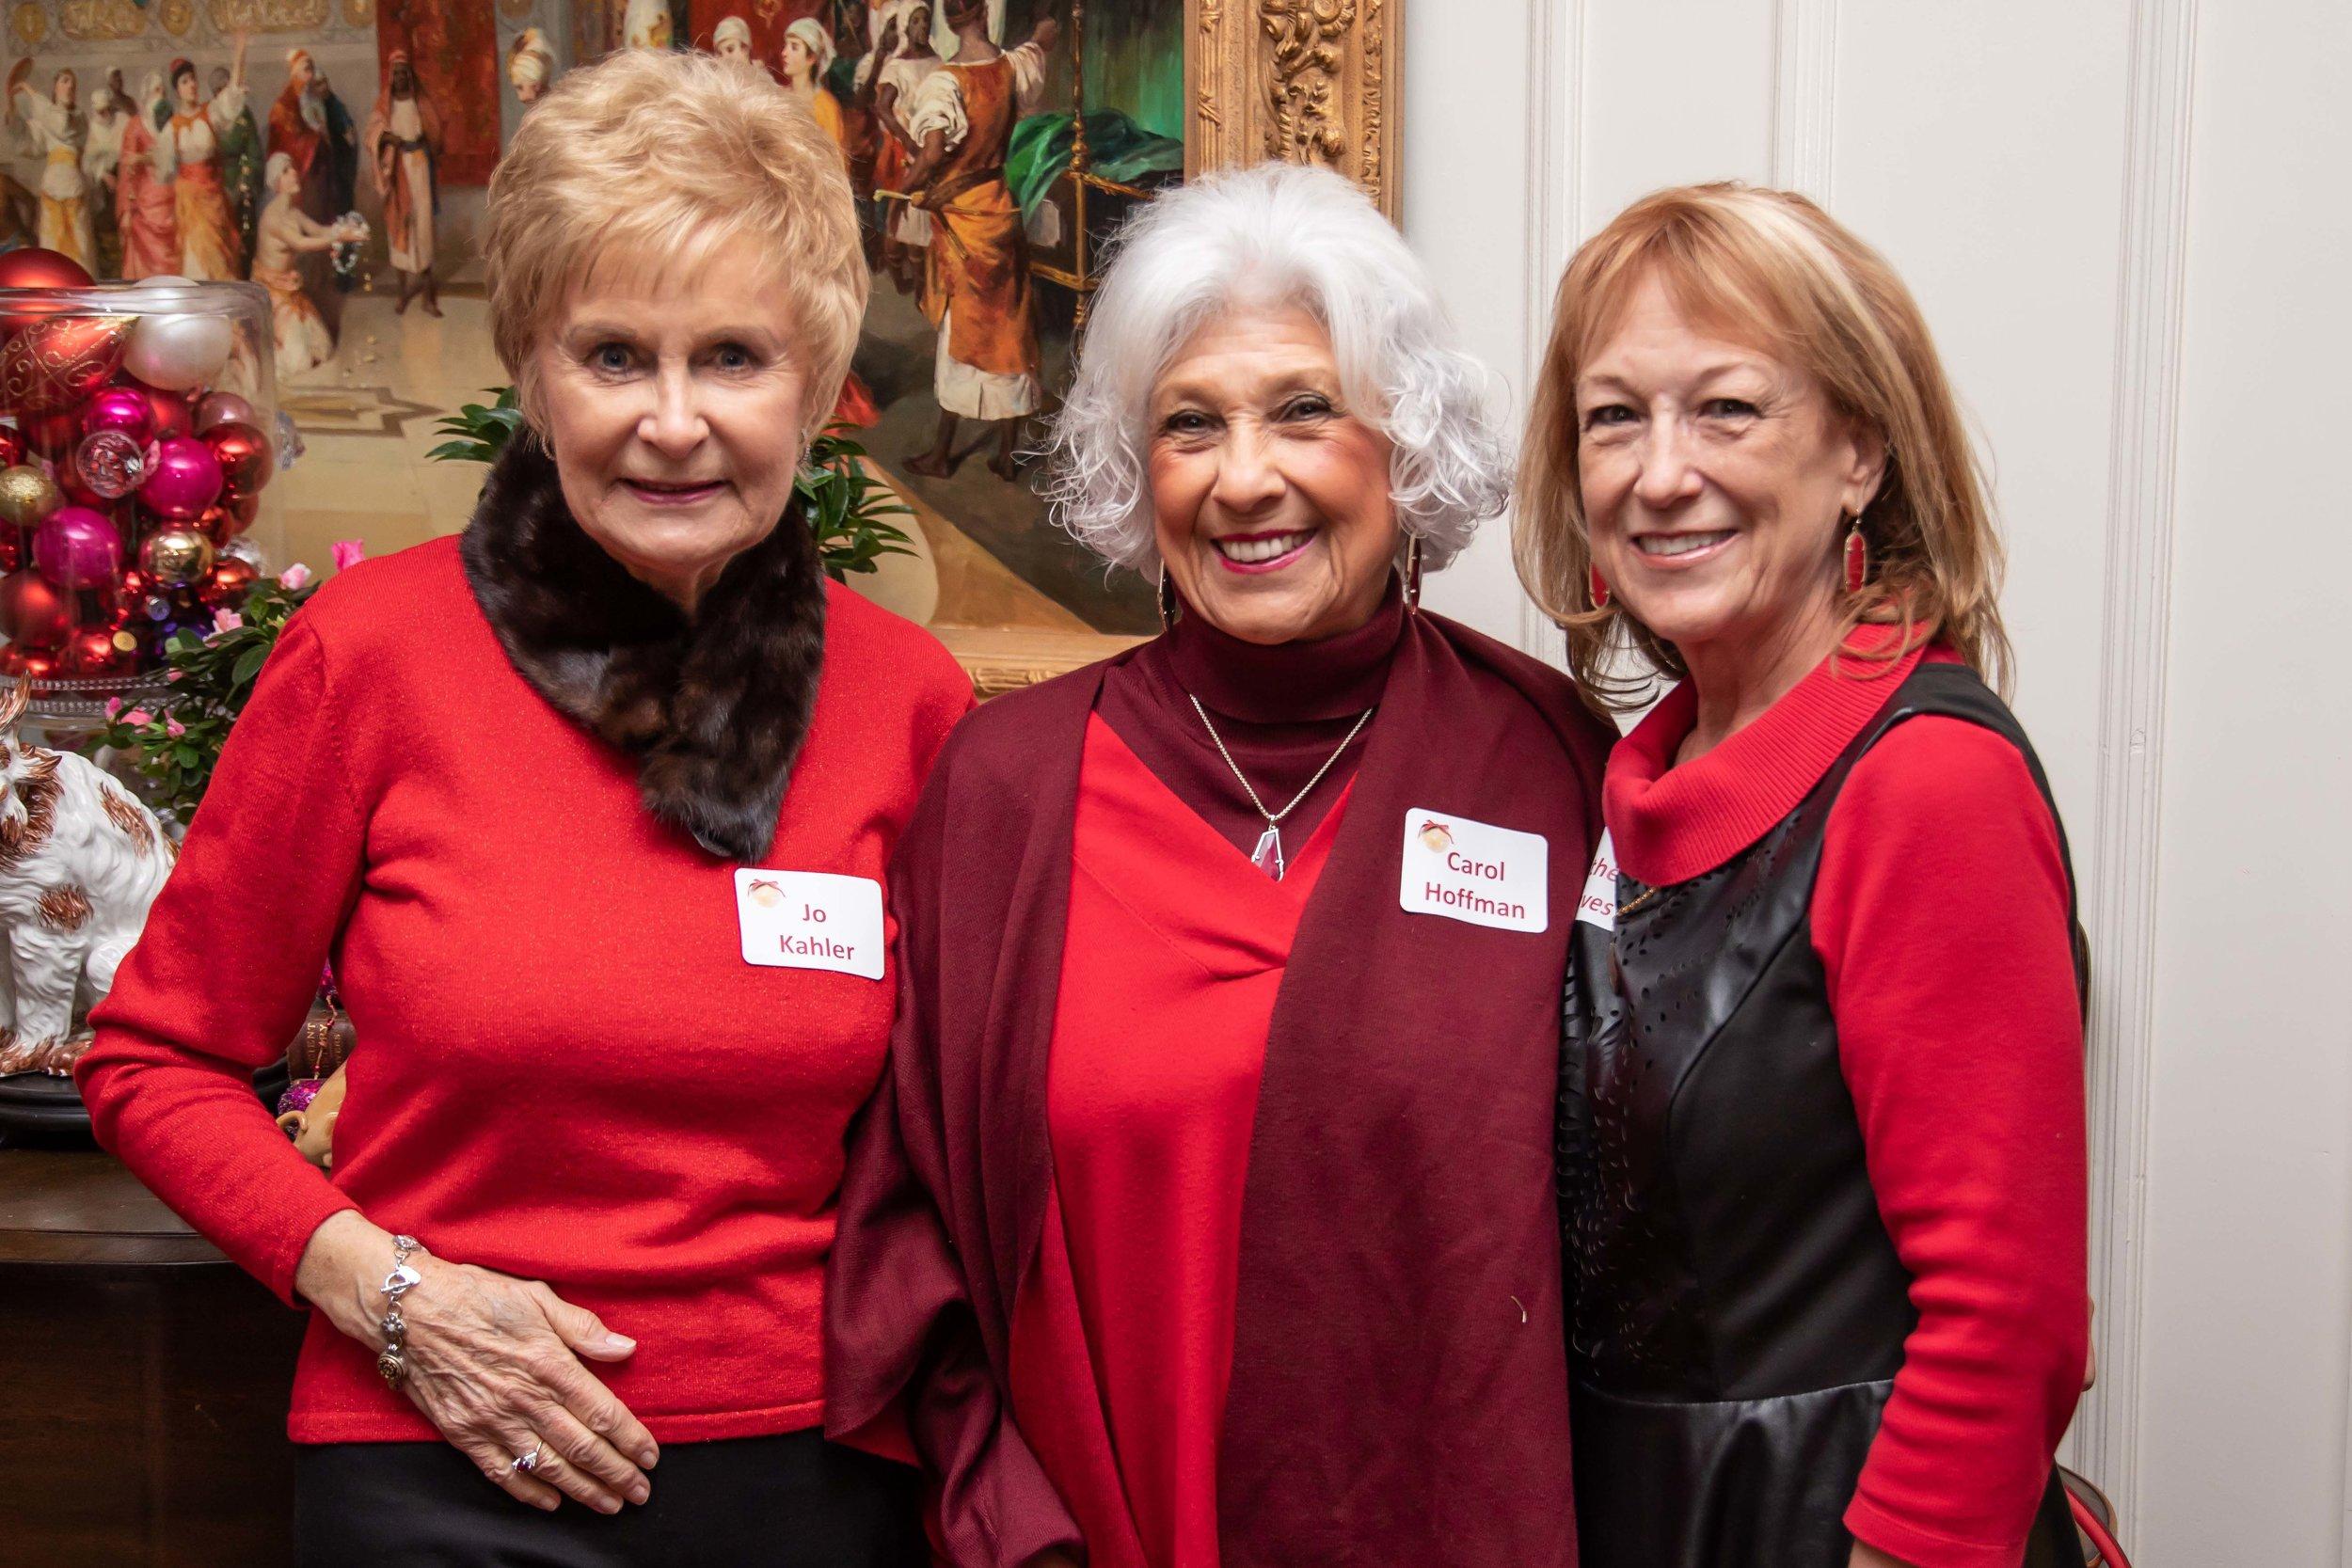 Jo Kahler, Carol Hoffman and Kathey Graves